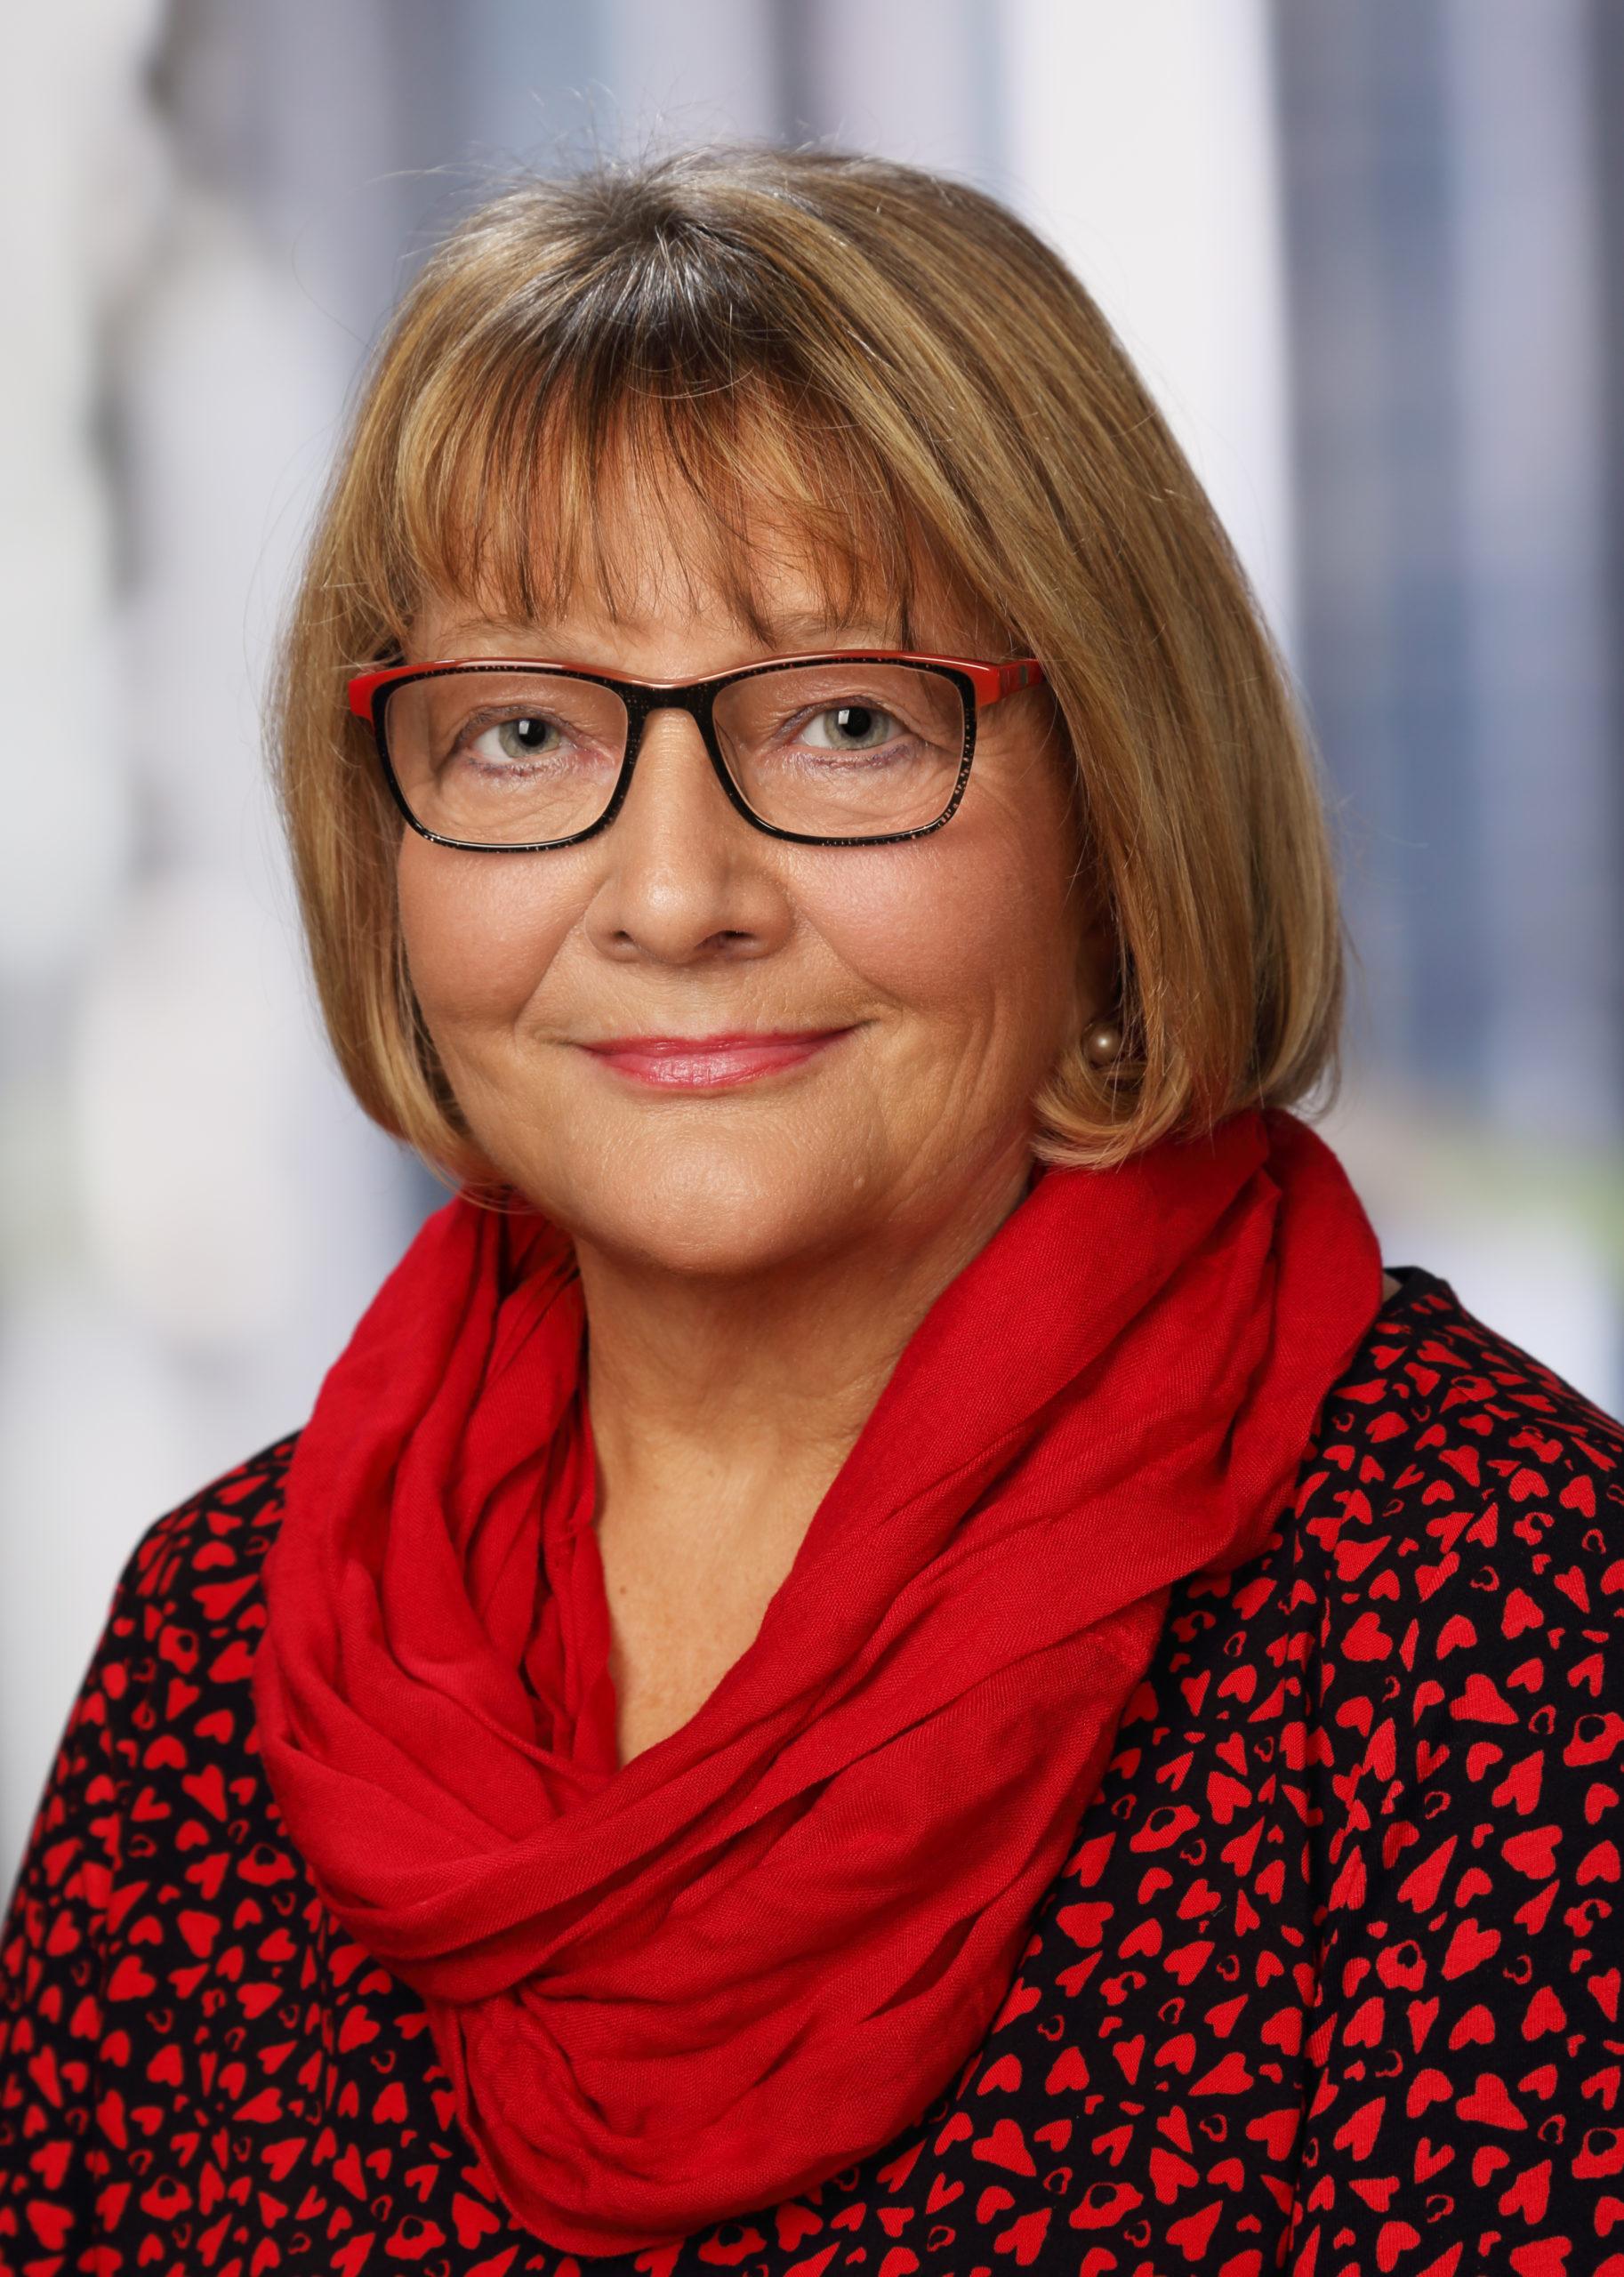 Ursula Suchanka